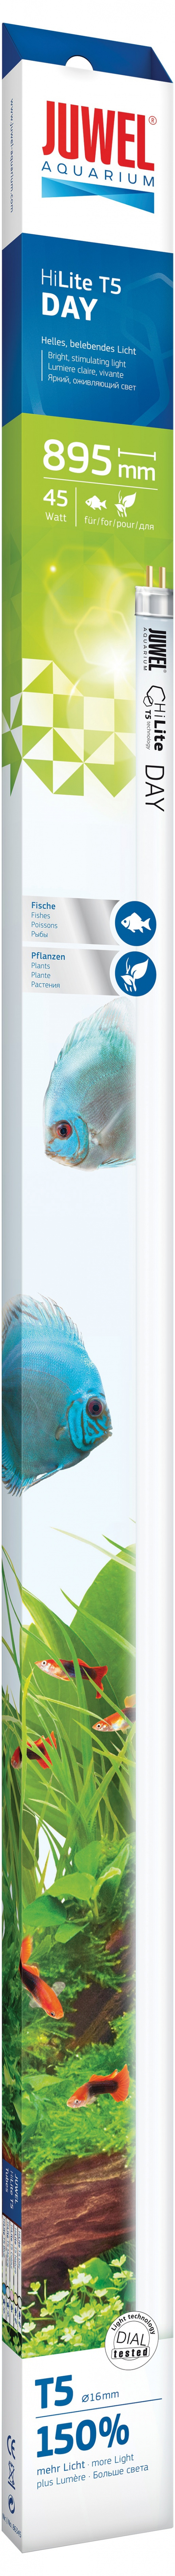 Лампа для аквариума - High-Lite Day T5 45W 895 мм, дневной свет title=